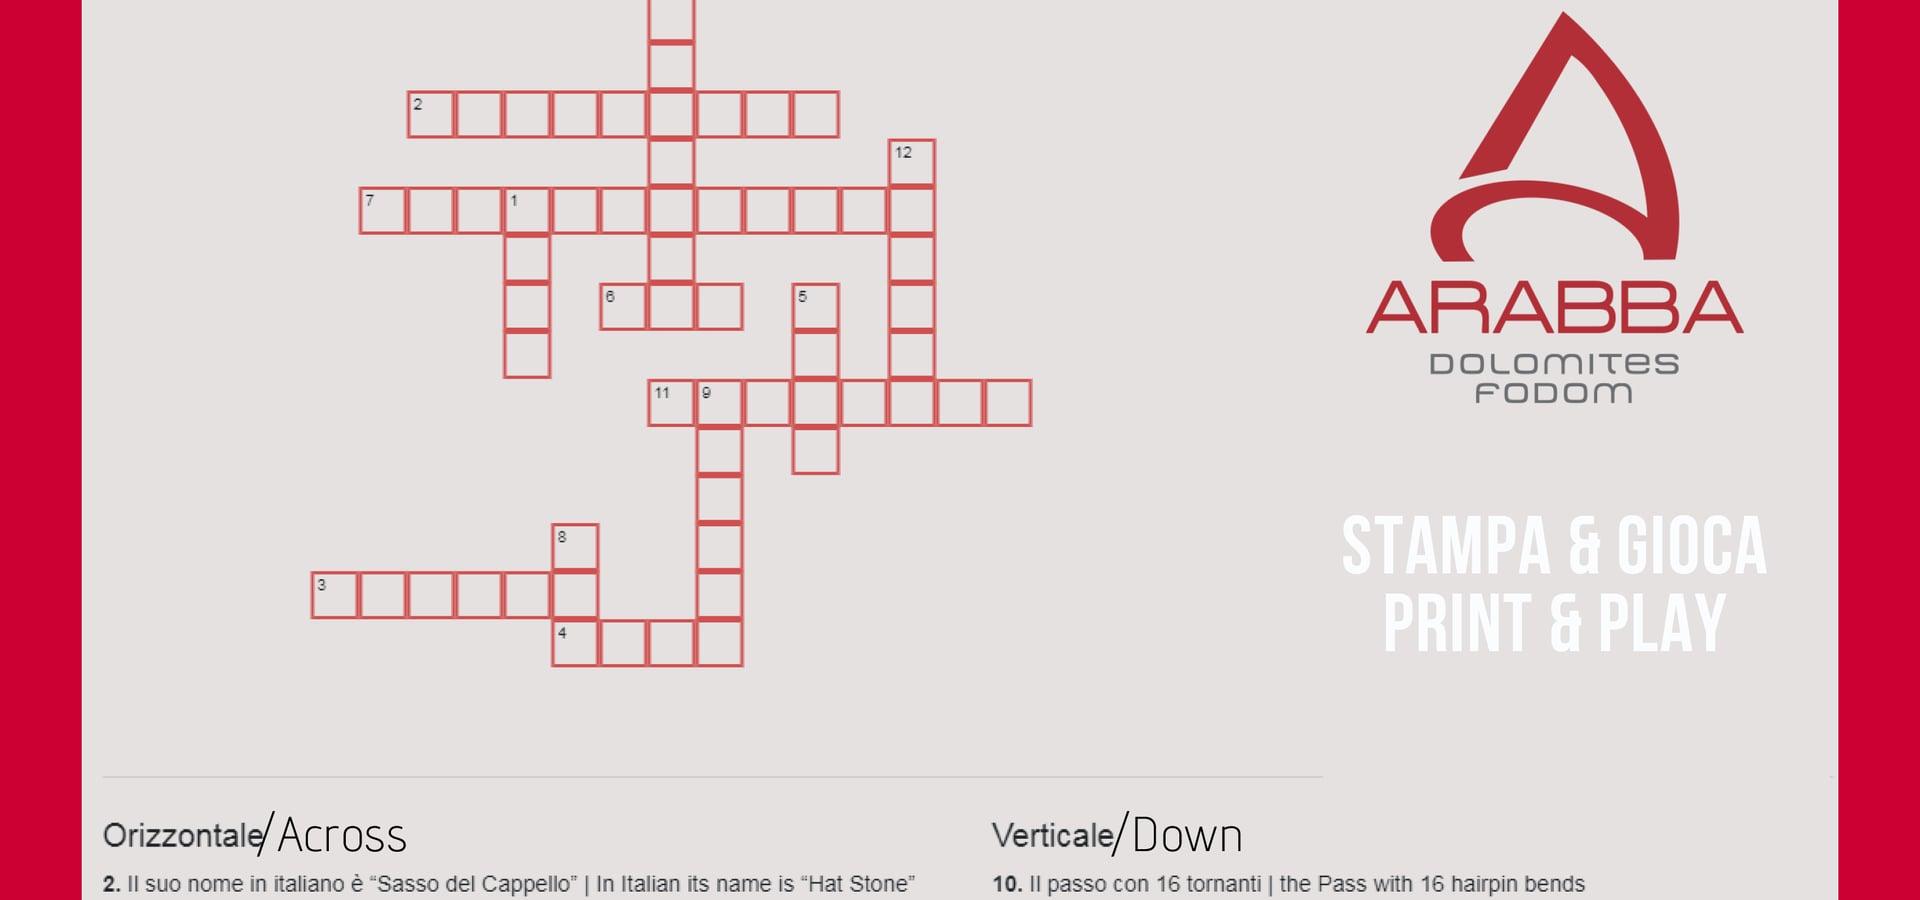 The Crossword Puzzle